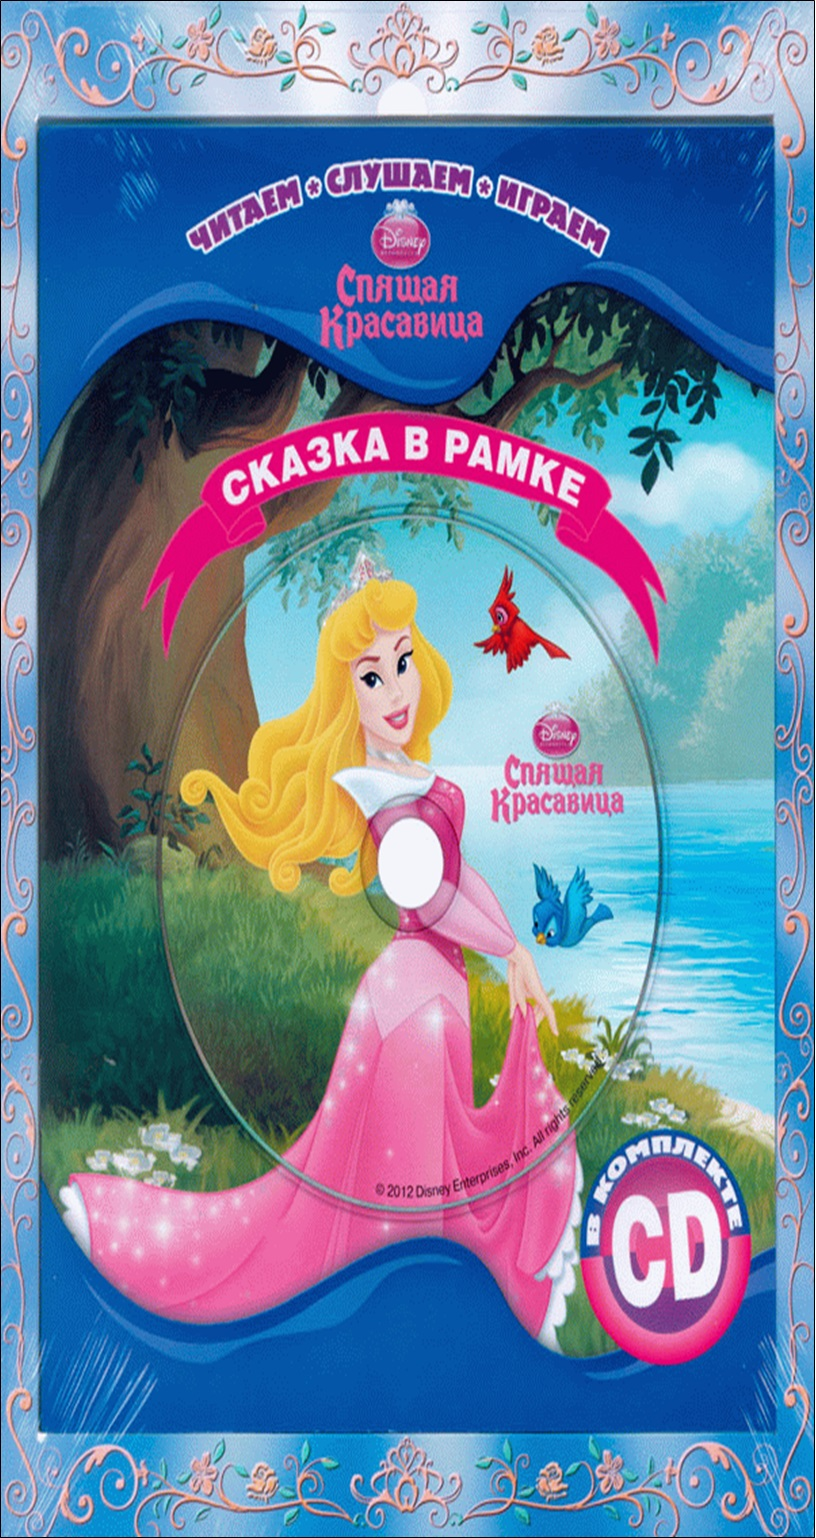 Спящая красавица. Сказка в рамке. Книга+CD красавица и чудовище dvd книга